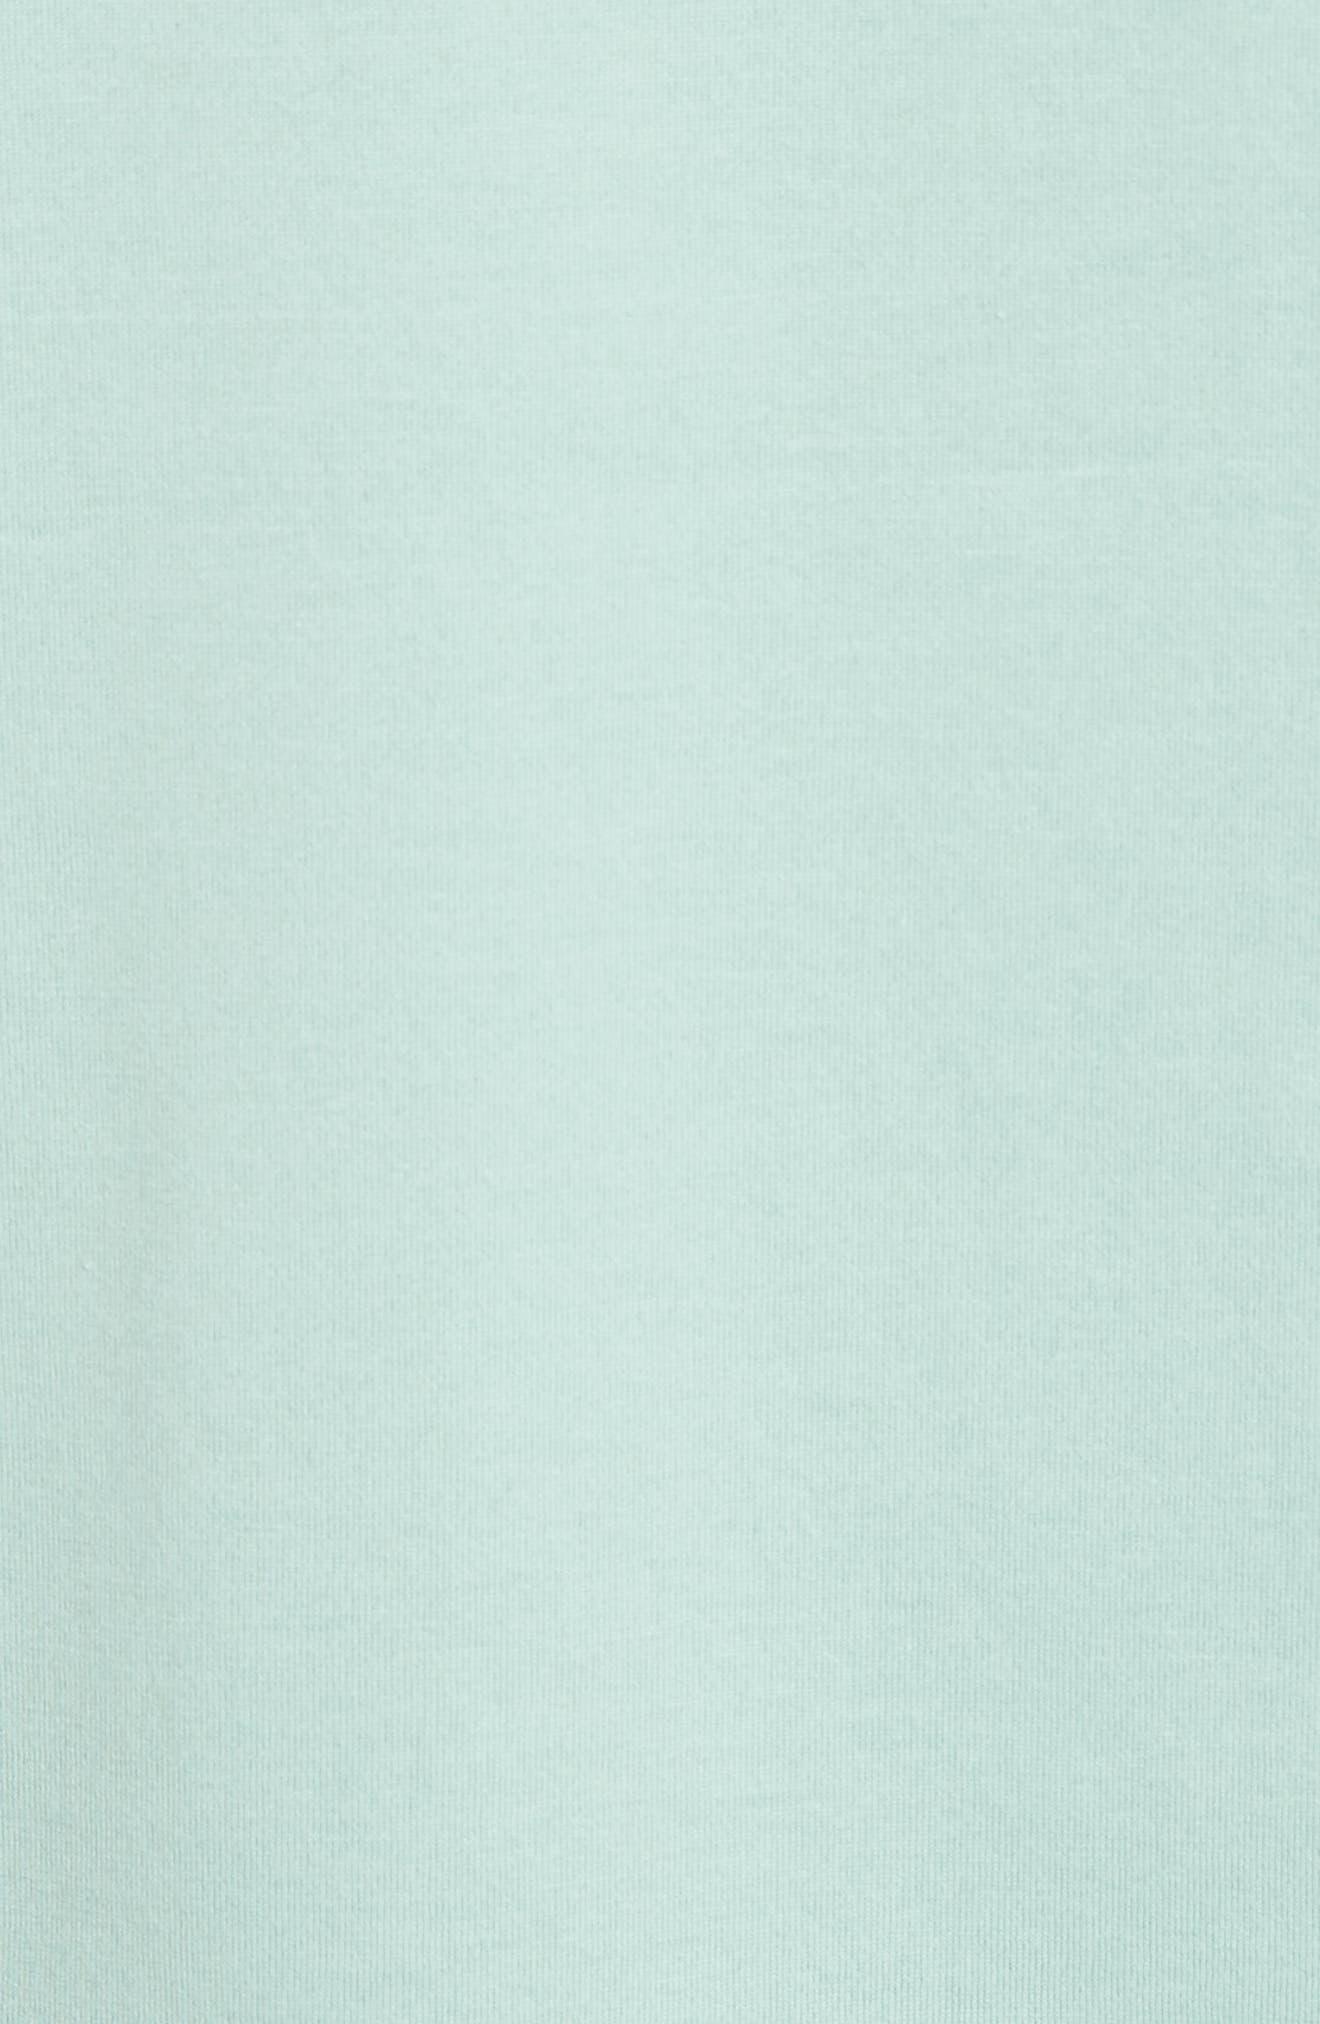 Missing Pocket T-Shirt,                             Alternate thumbnail 5, color,                             330